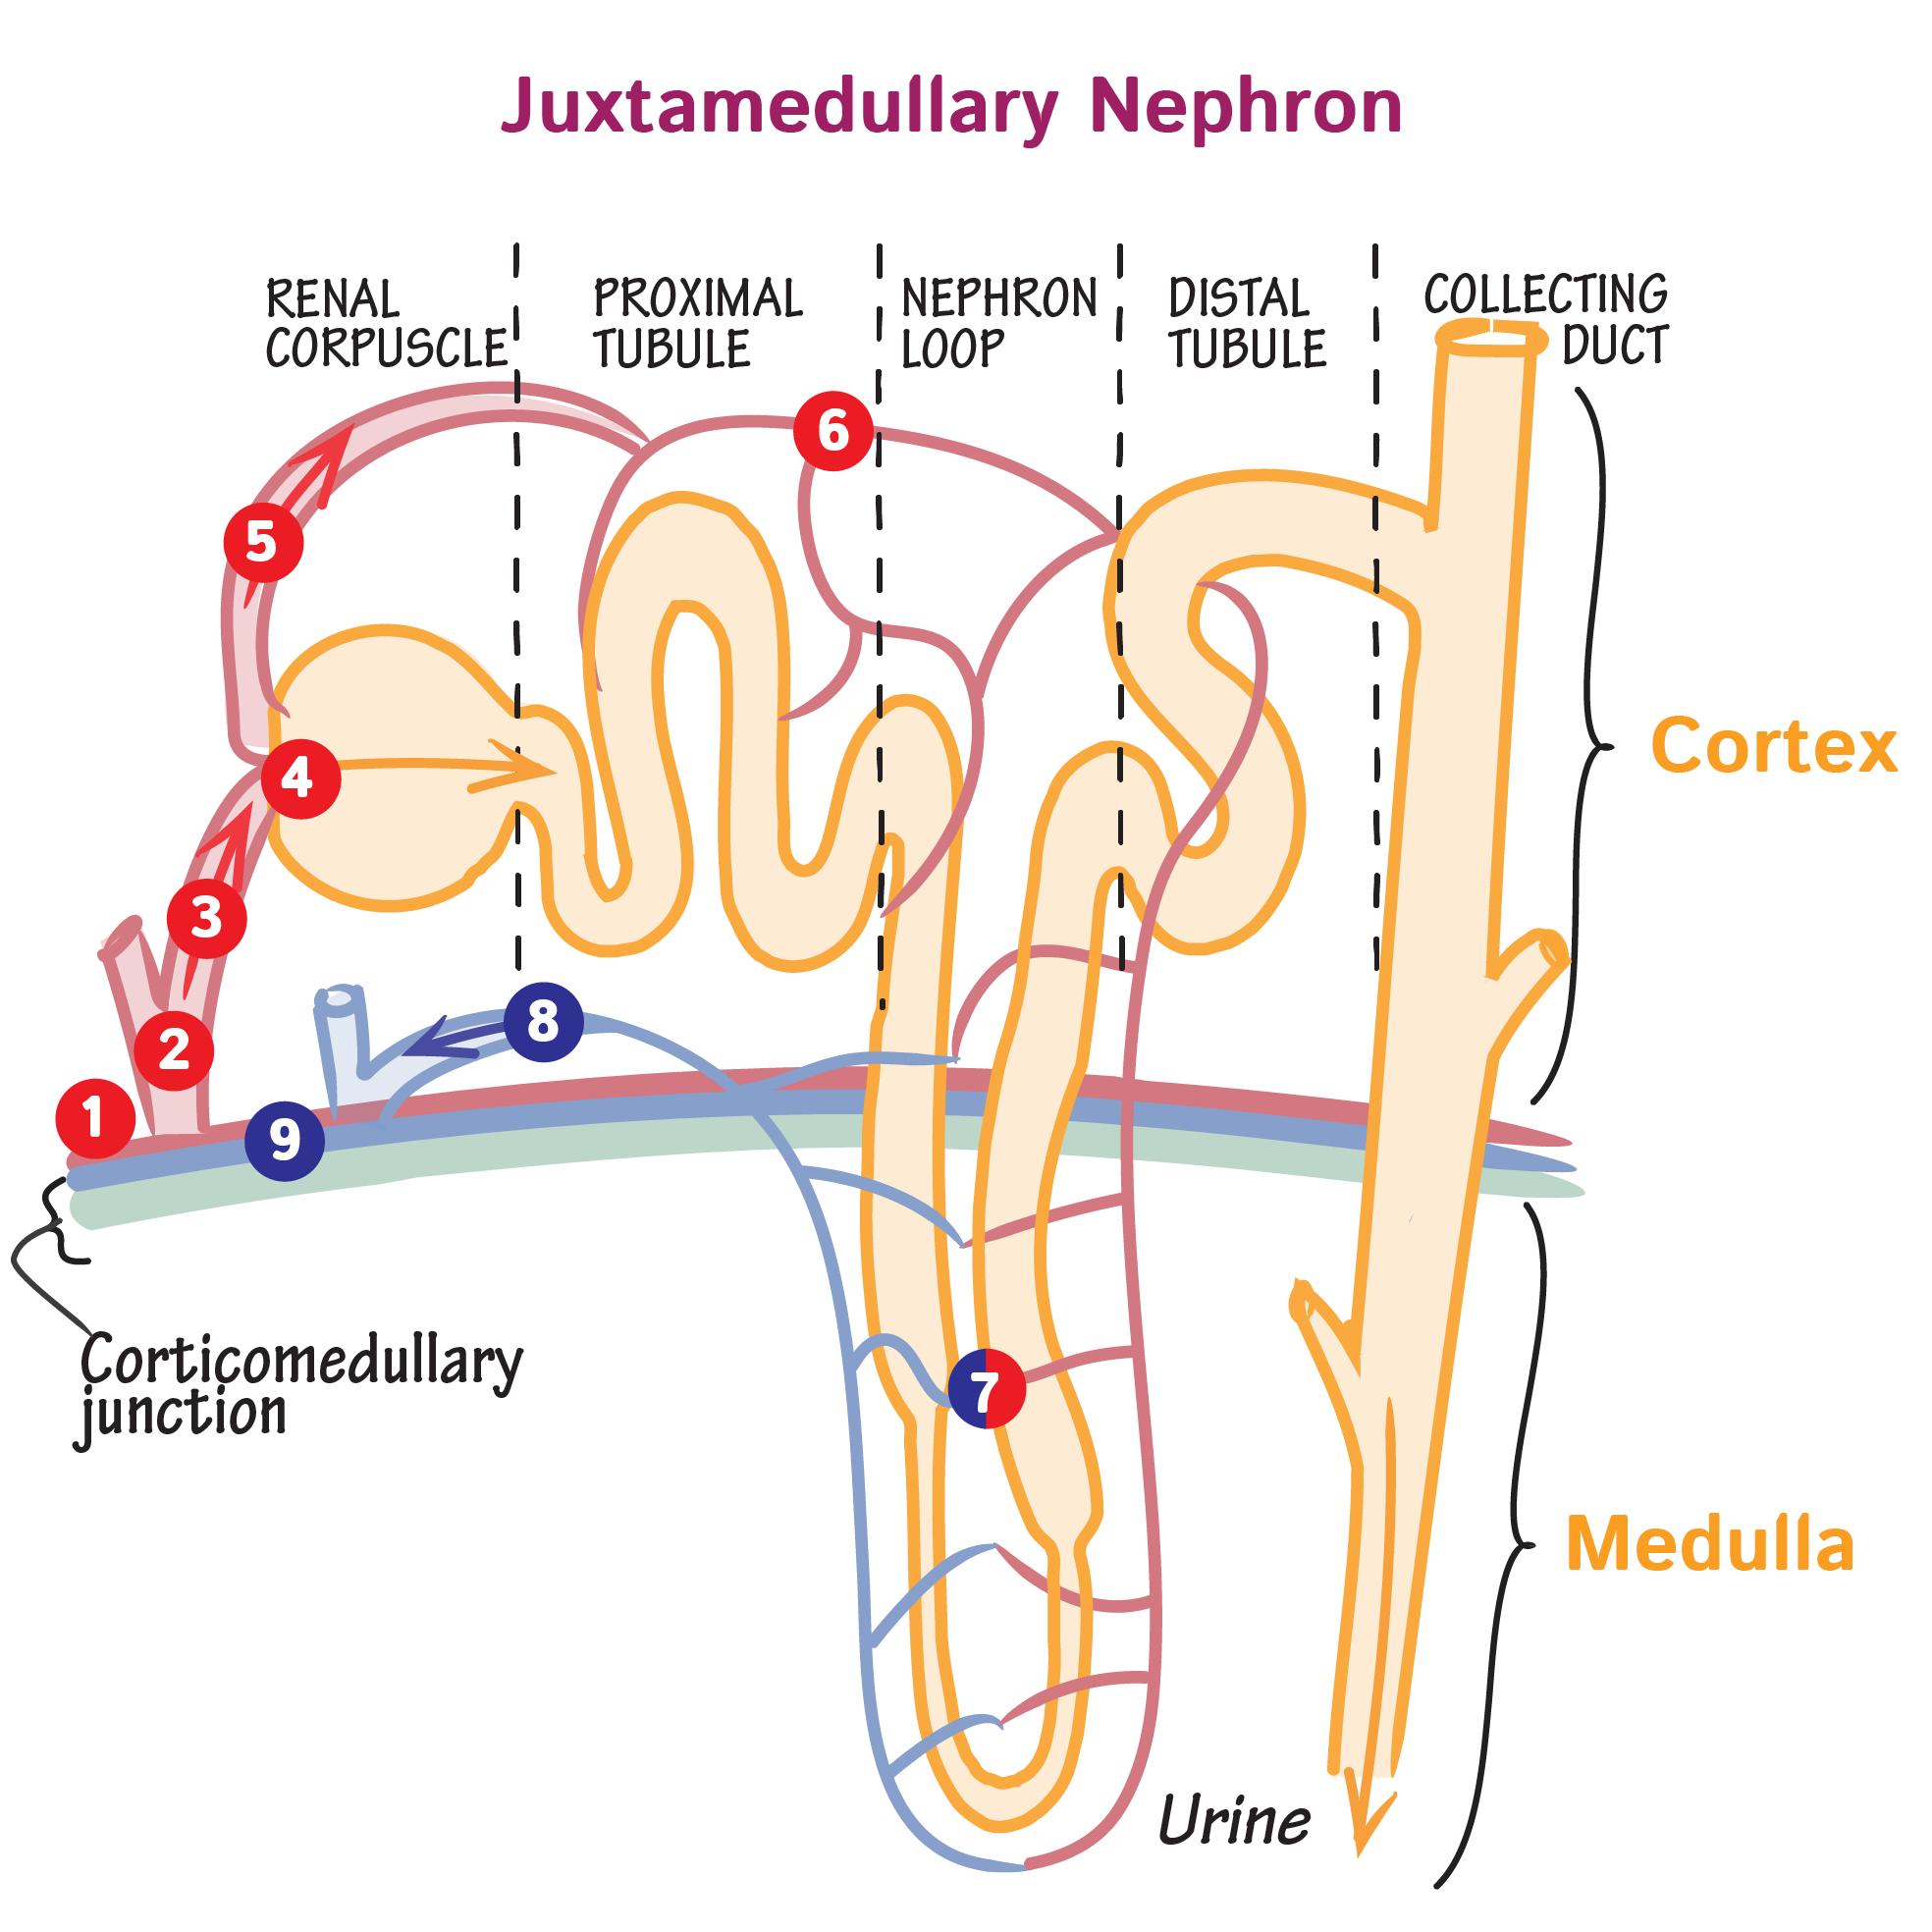 Gross Anatomy Glossary: Juxtamedullary Nephron Blood Supply | Draw ...